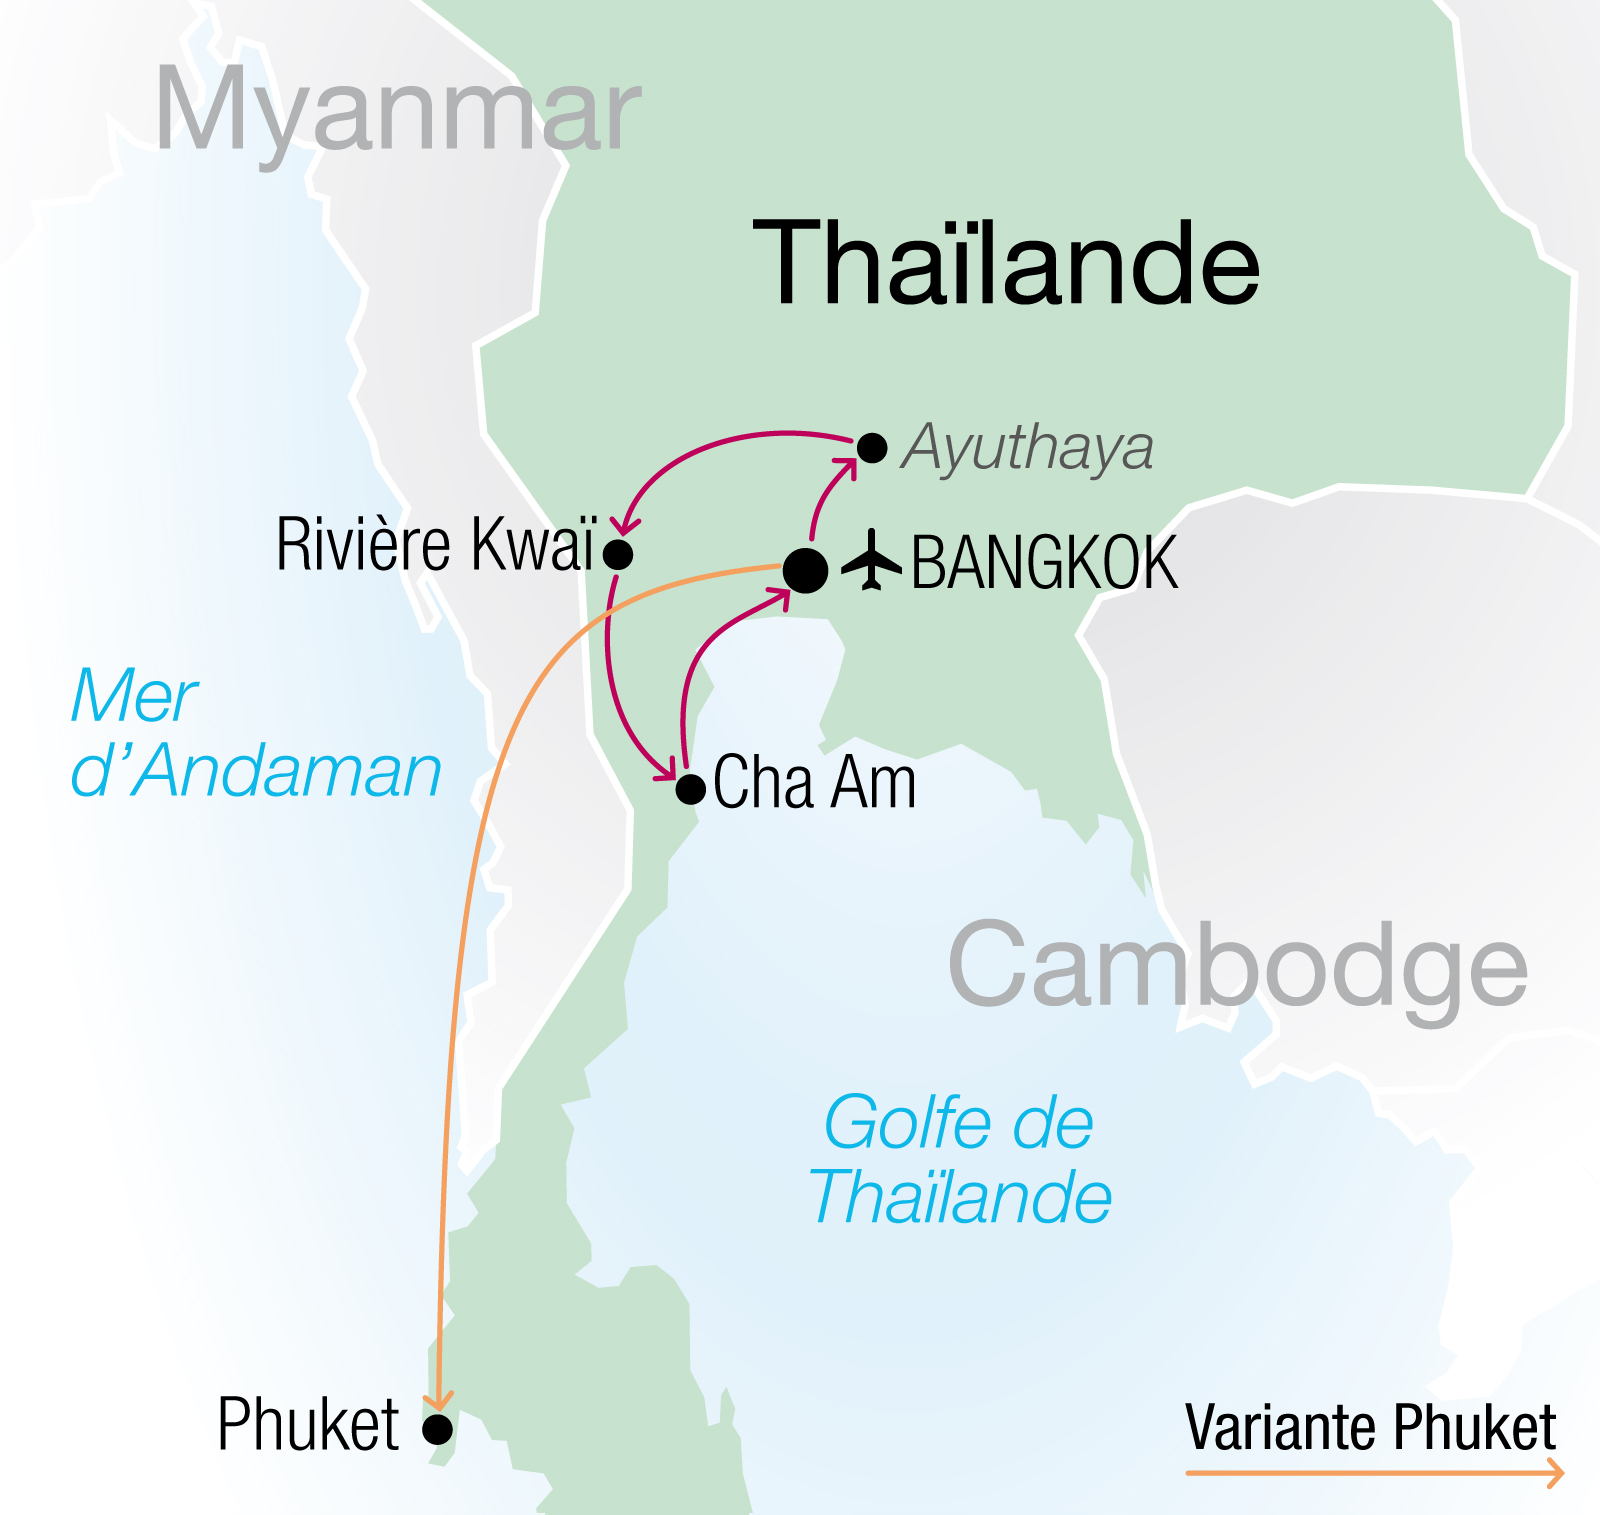 Bien organiser des circuits thailande en famille